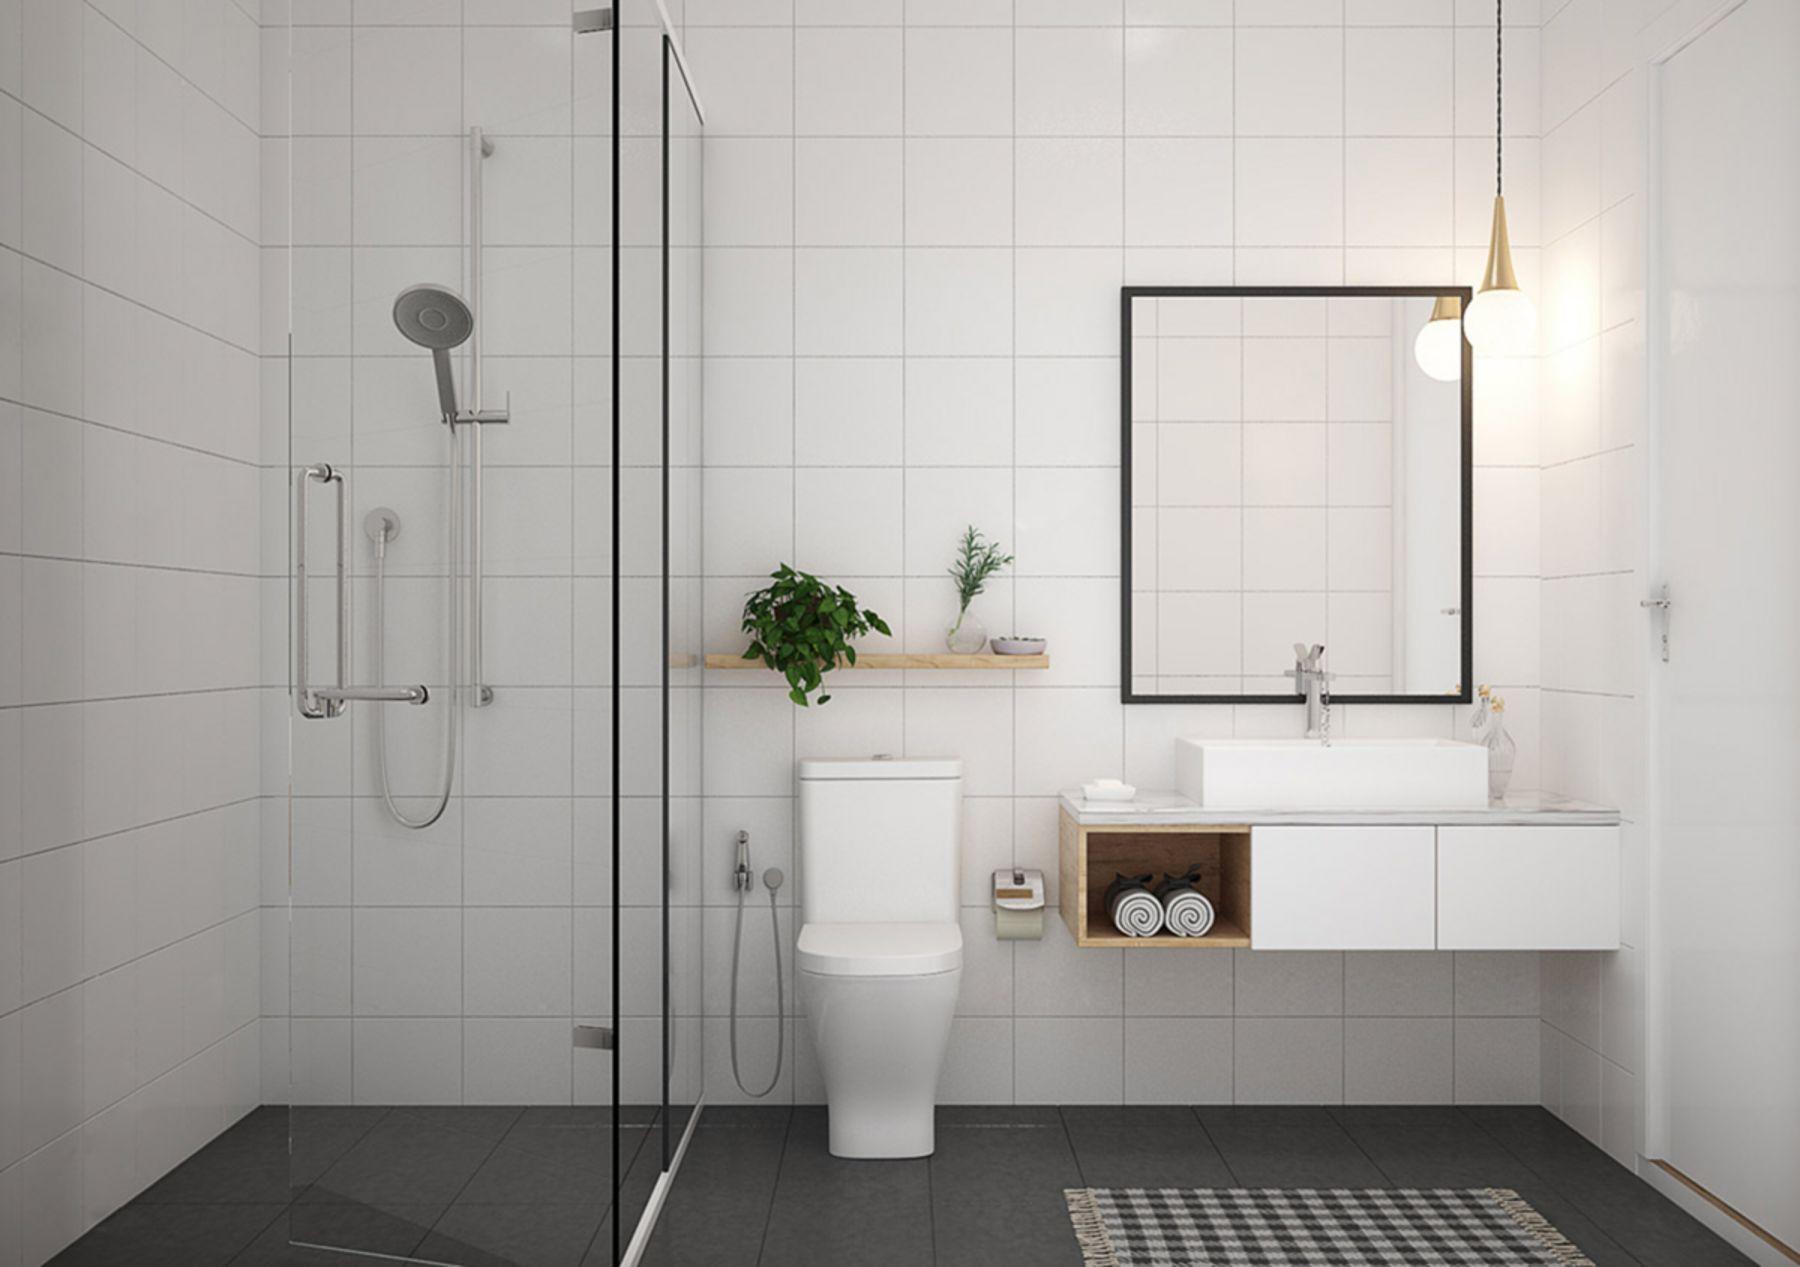 12 Attractive Minimalist Bathroom Design Ideas On A Budget Minimalist Bathroom Design Scandinavian Bathroom Design Ideas Bathroom Styling Minimalist bathroom decor idea